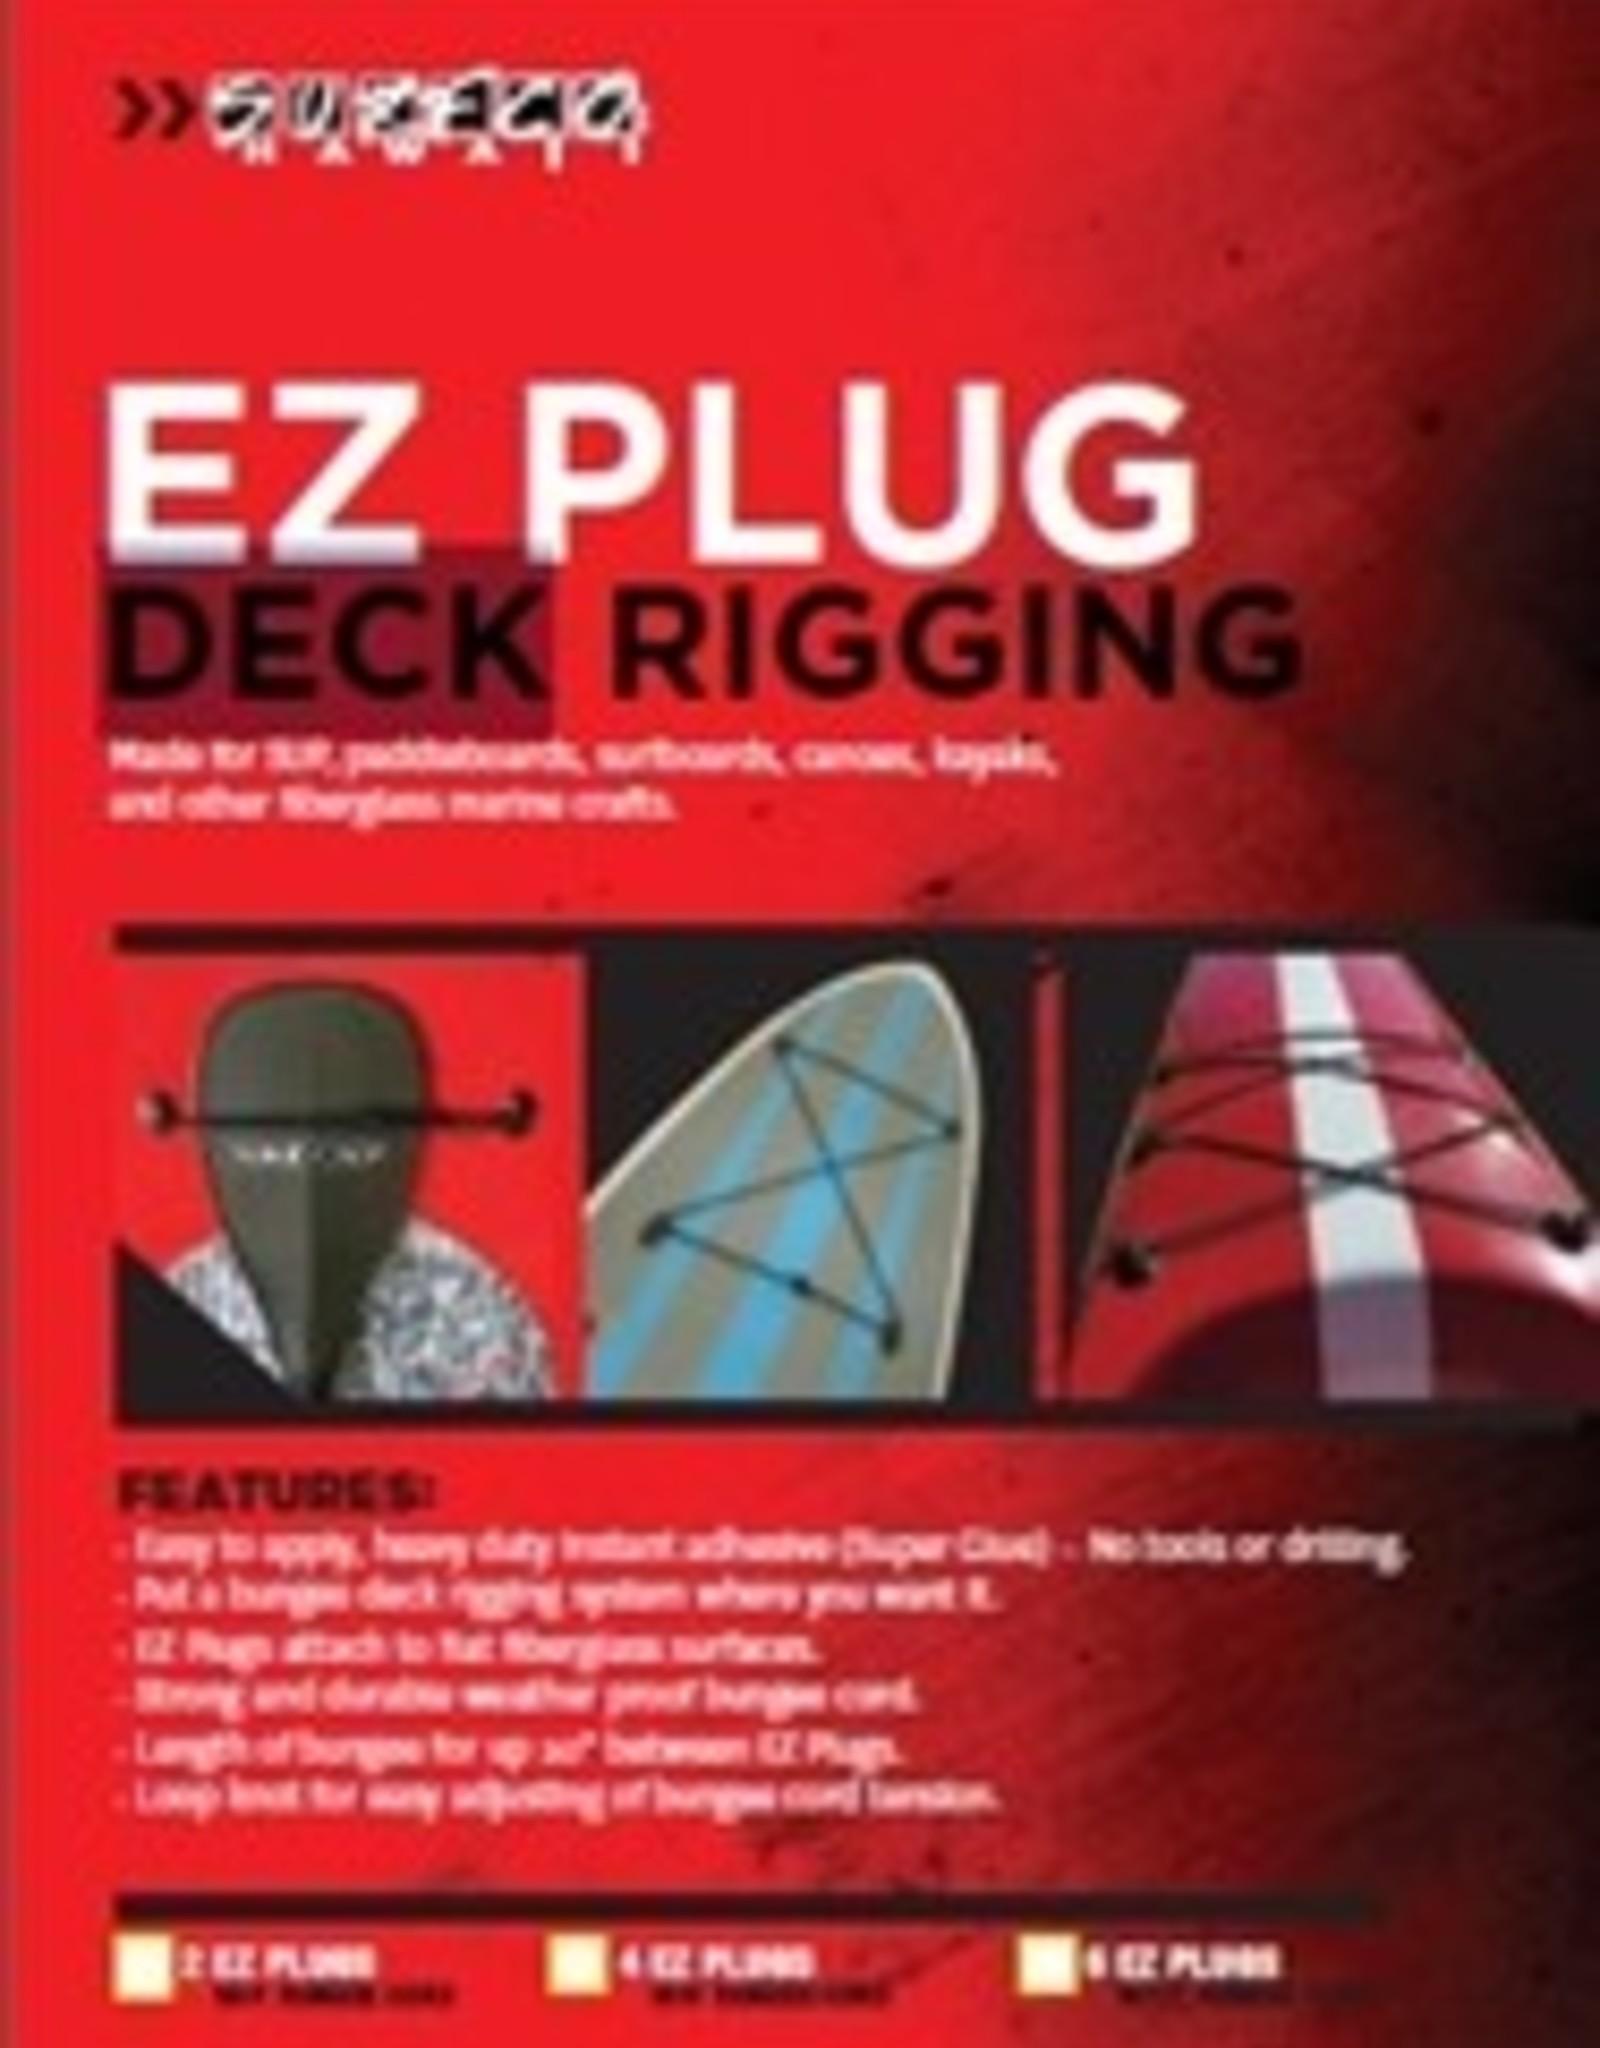 EZ PLUG DECK RIGGING